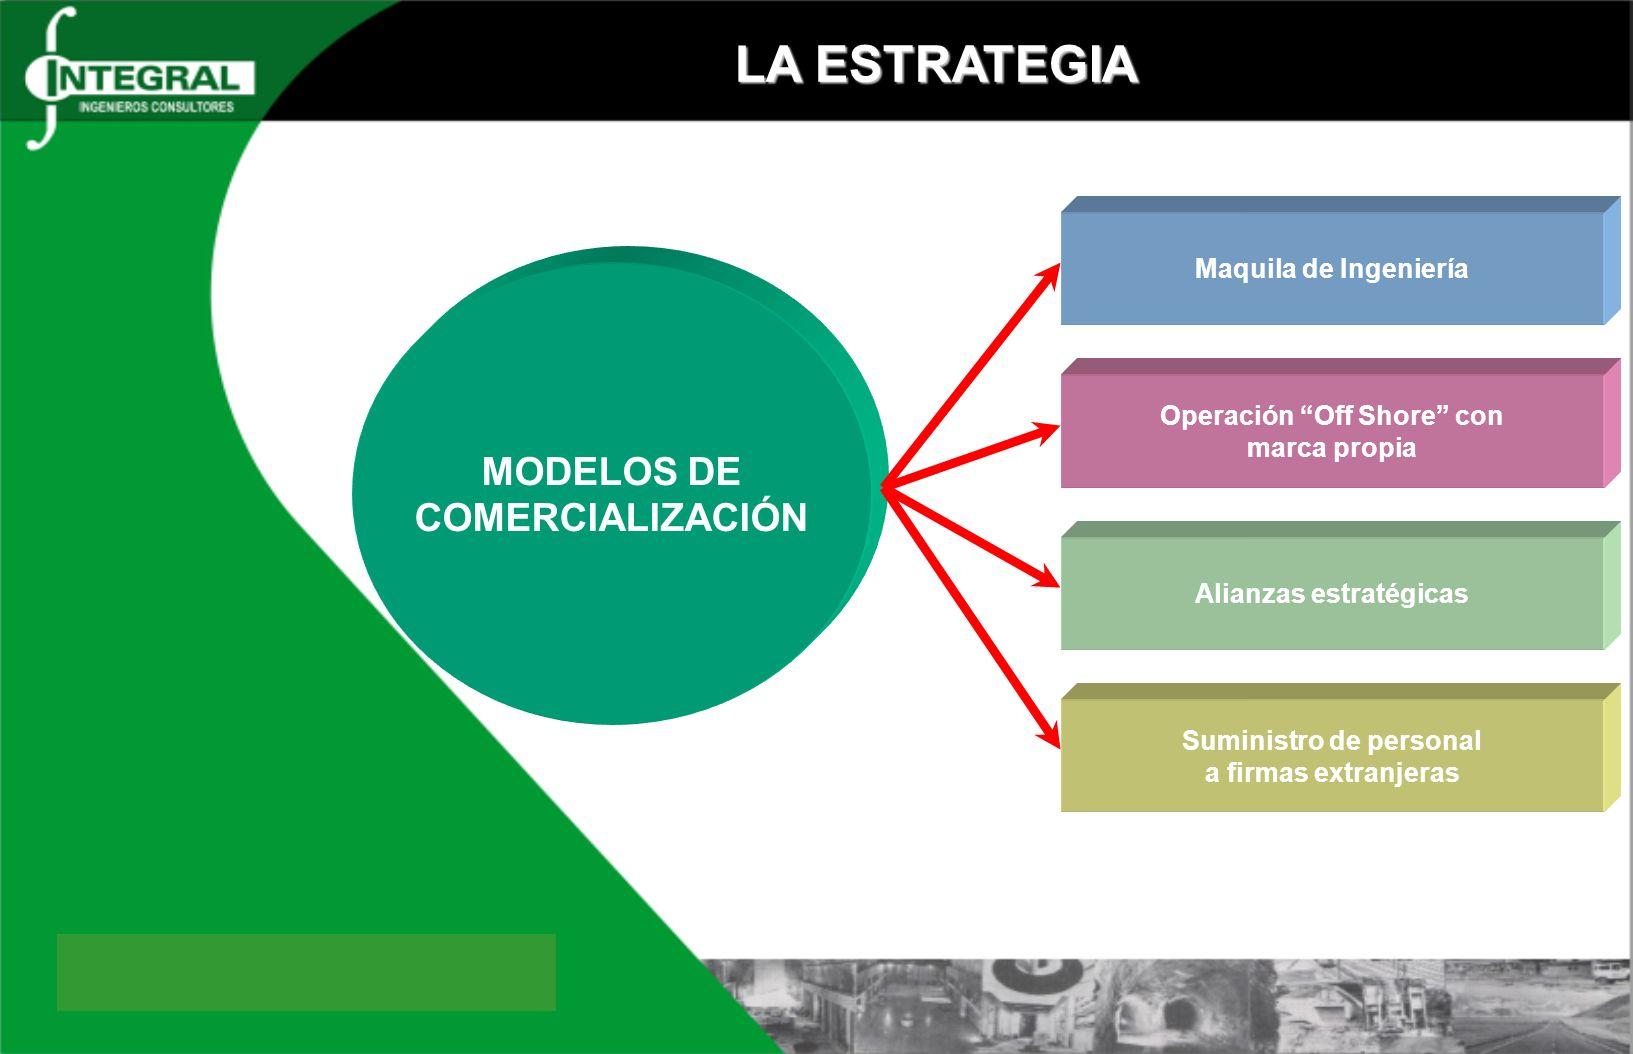 Operación Off Shore con Alianzas estratégicas Suministro de personal